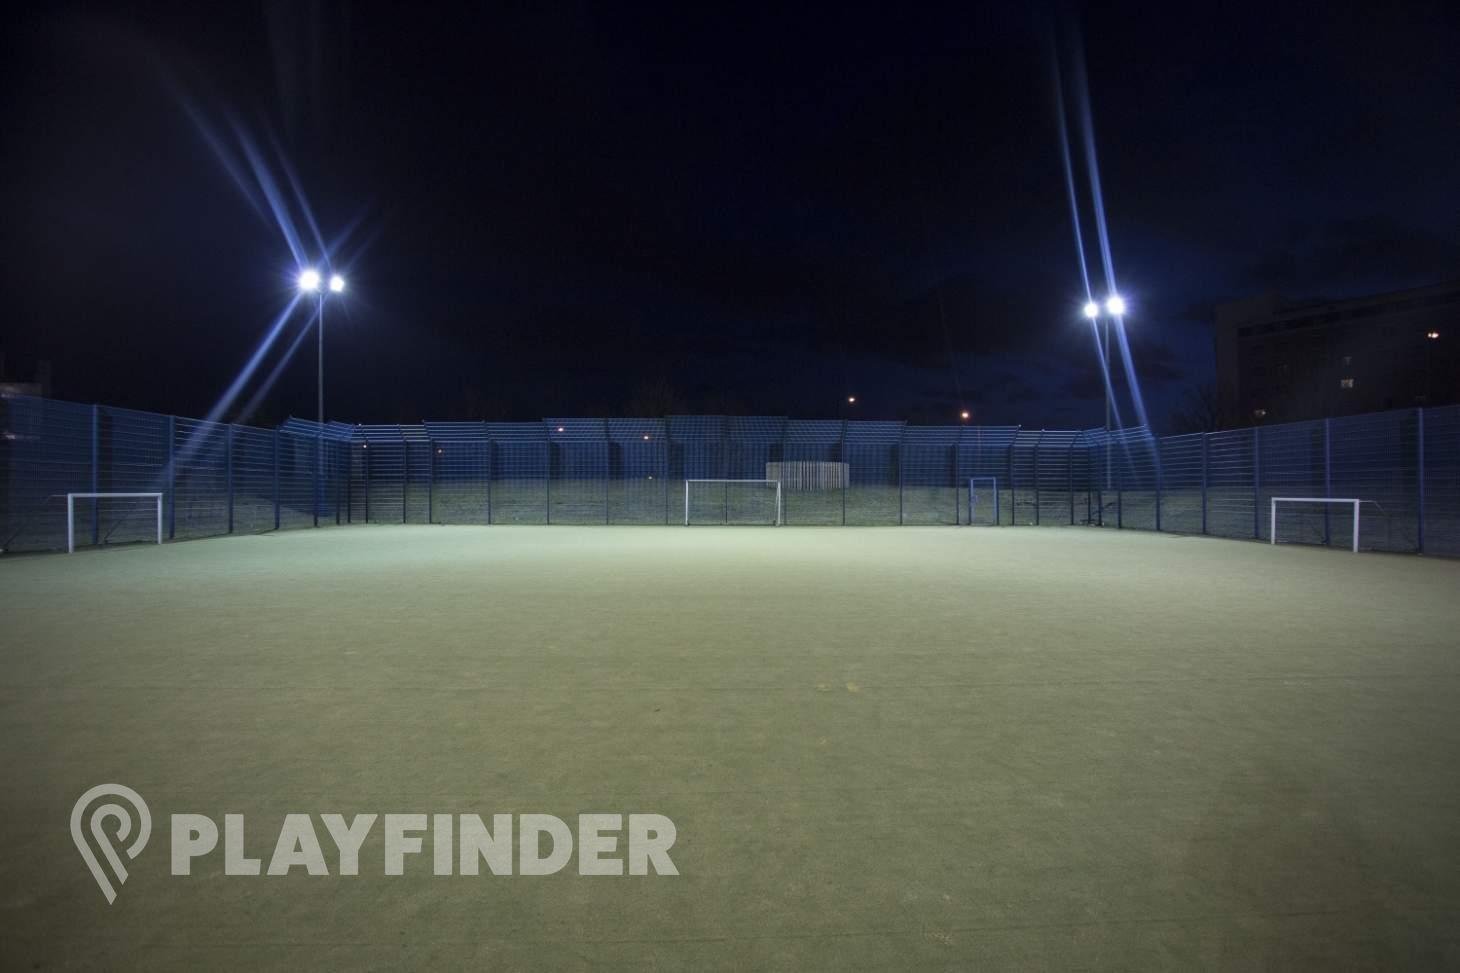 Millennium Primary School Outdoor | Astroturf hockey pitch